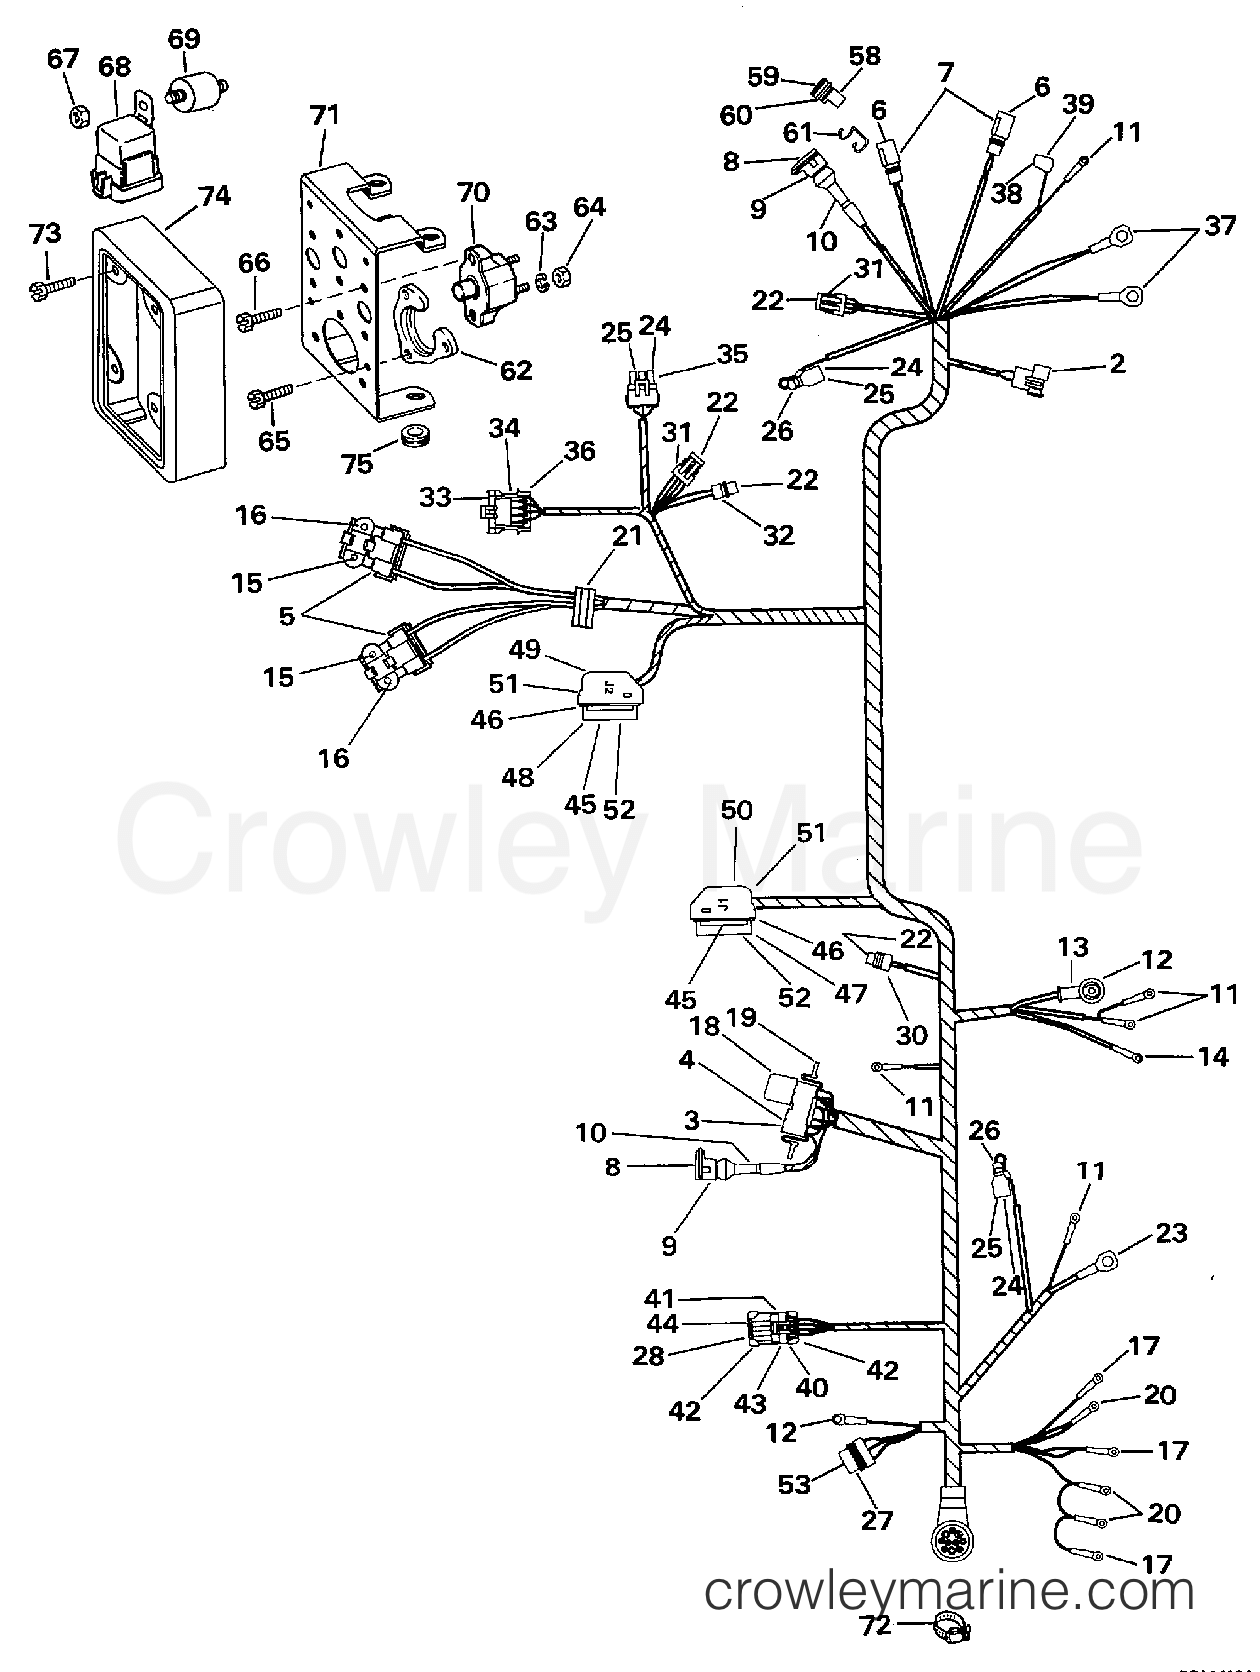 1997 omc stern drive 4 3 434bplkd engine wire harness bracket tbi models